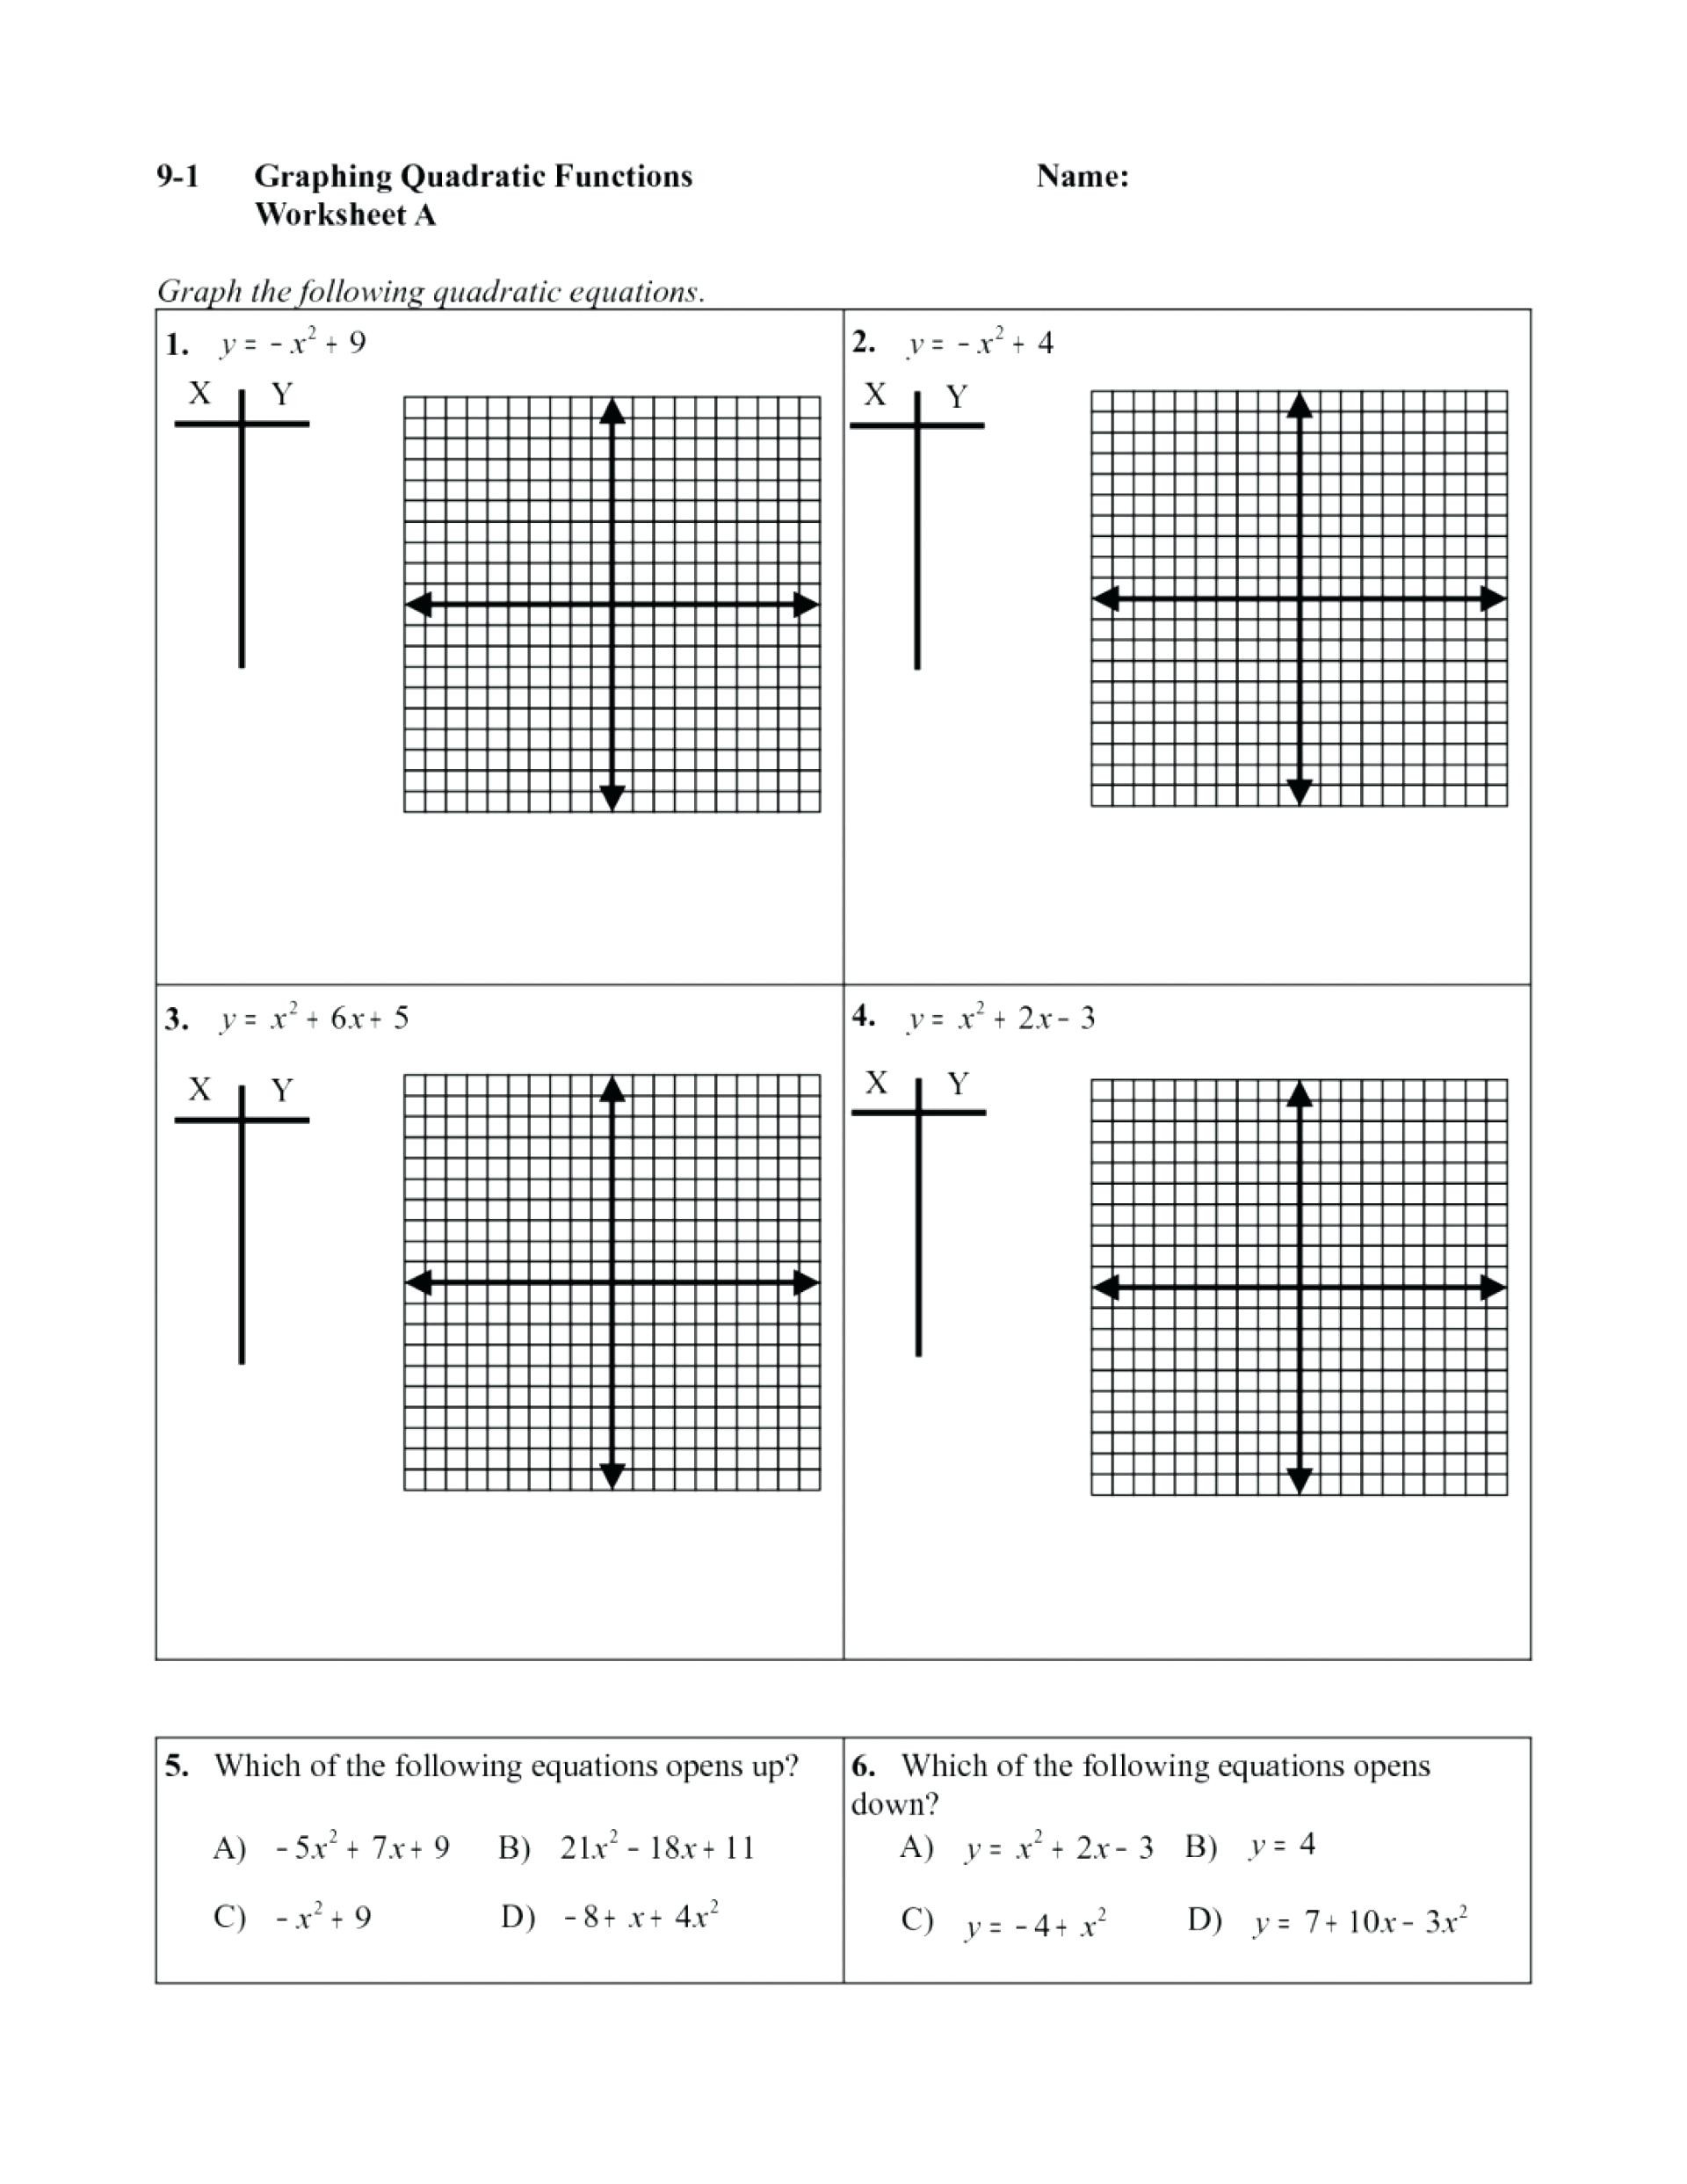 Graphing Quadratic Functions Worksheet Worksheet Graphing Quadratic Functions In Vertex form